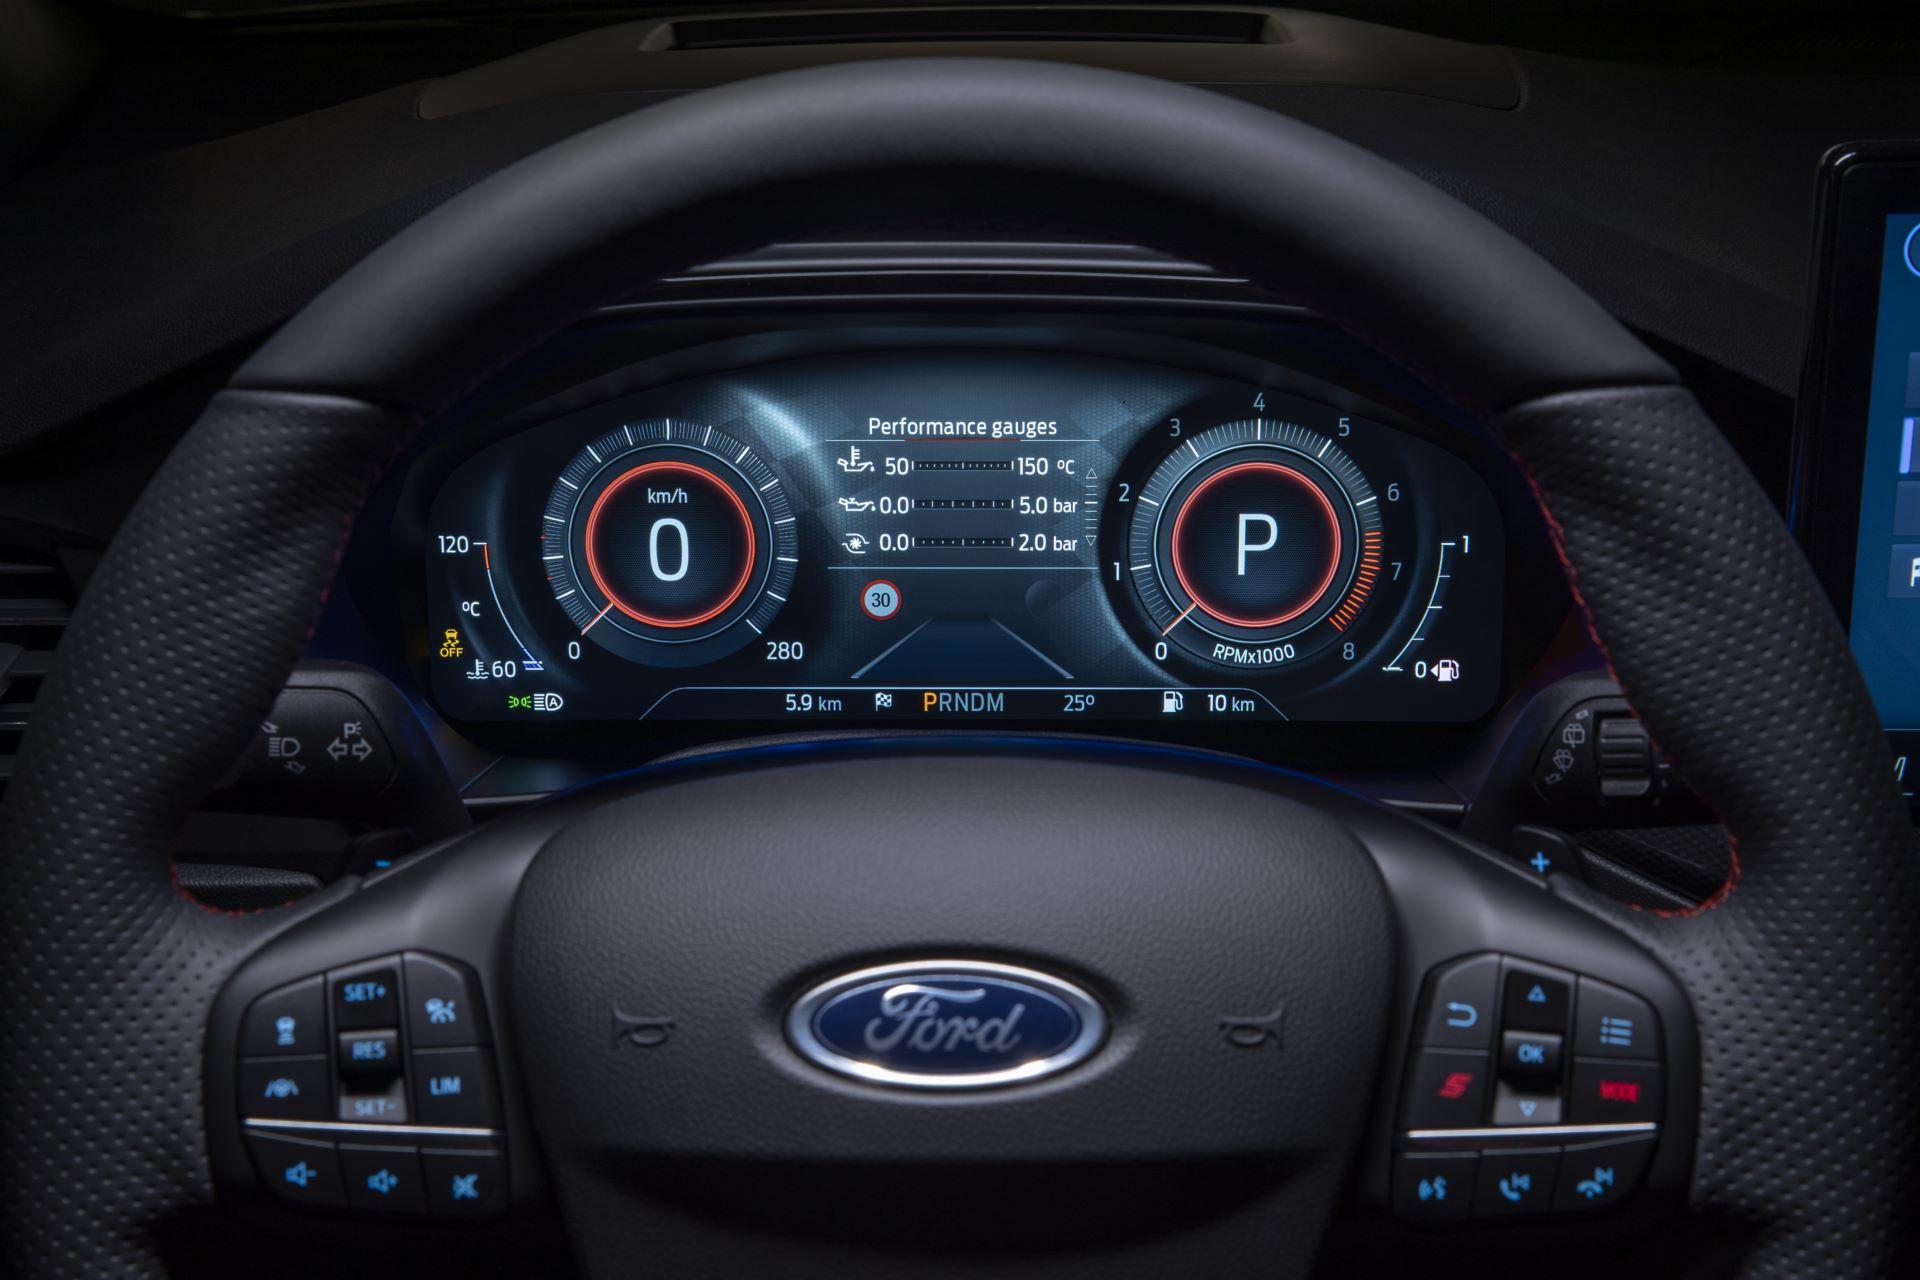 Ford-Focus-ST-facelift-2021-11